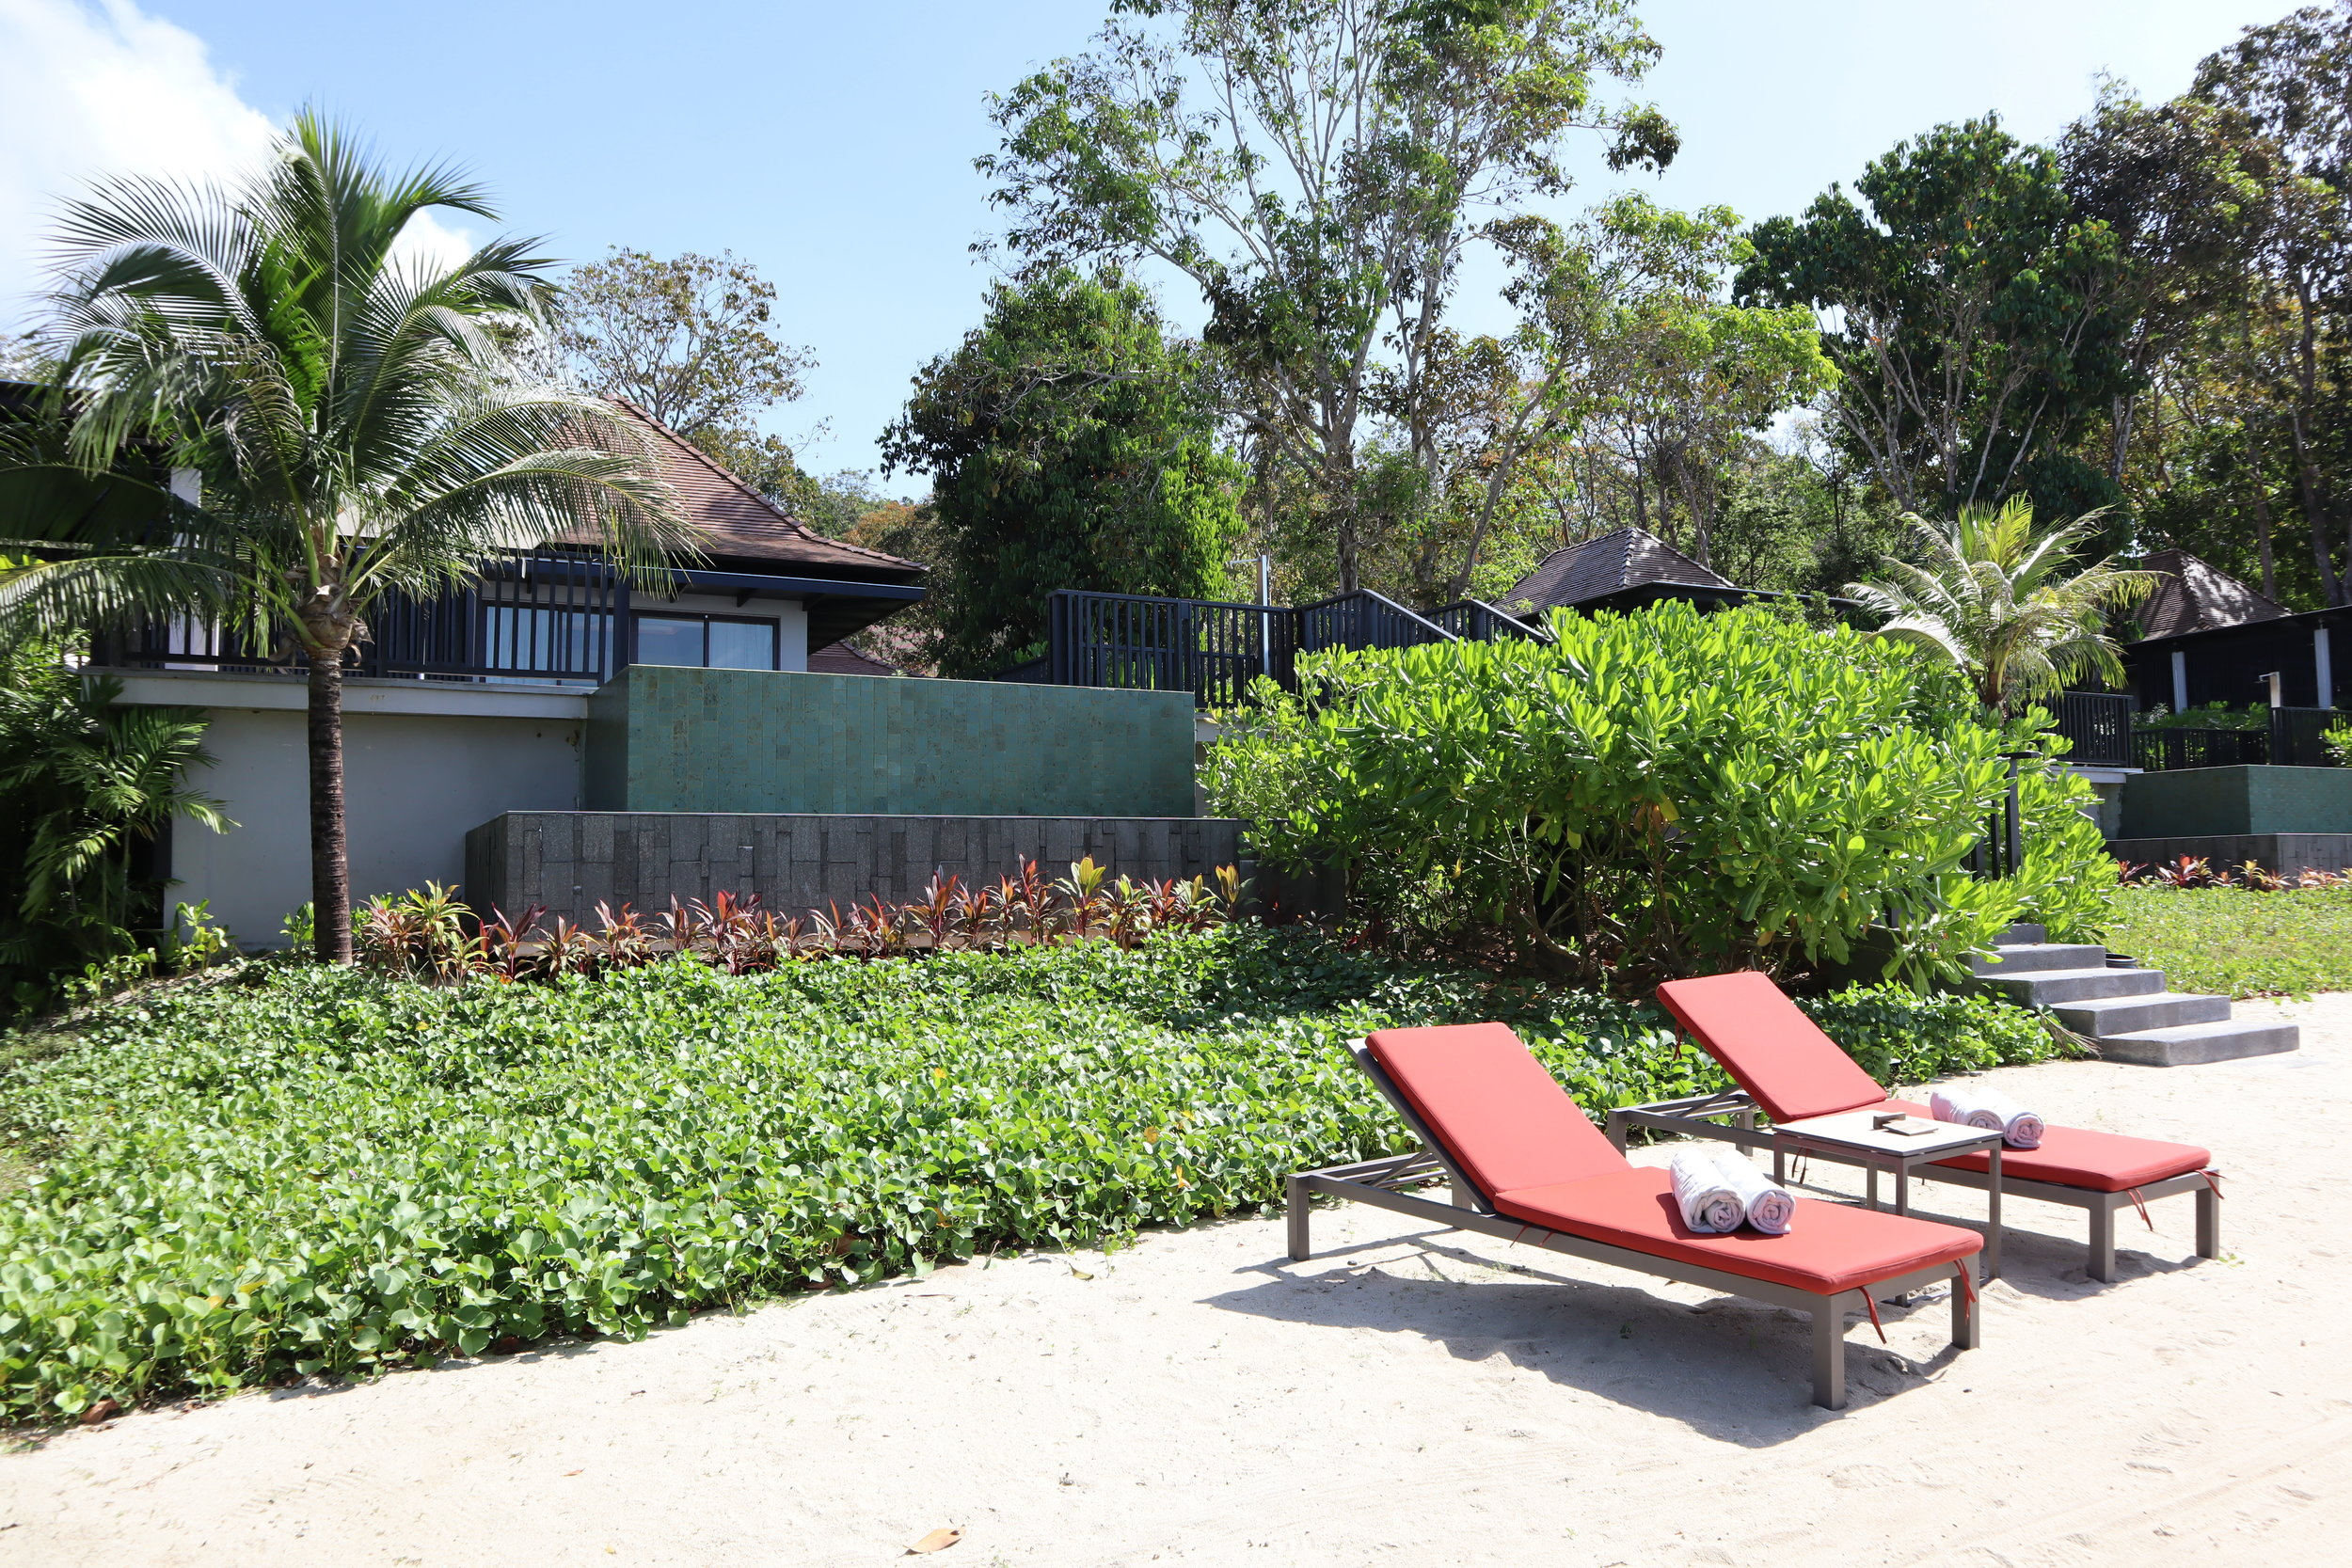 The Ritz-Carlton, Langkawi – Beachfront villas